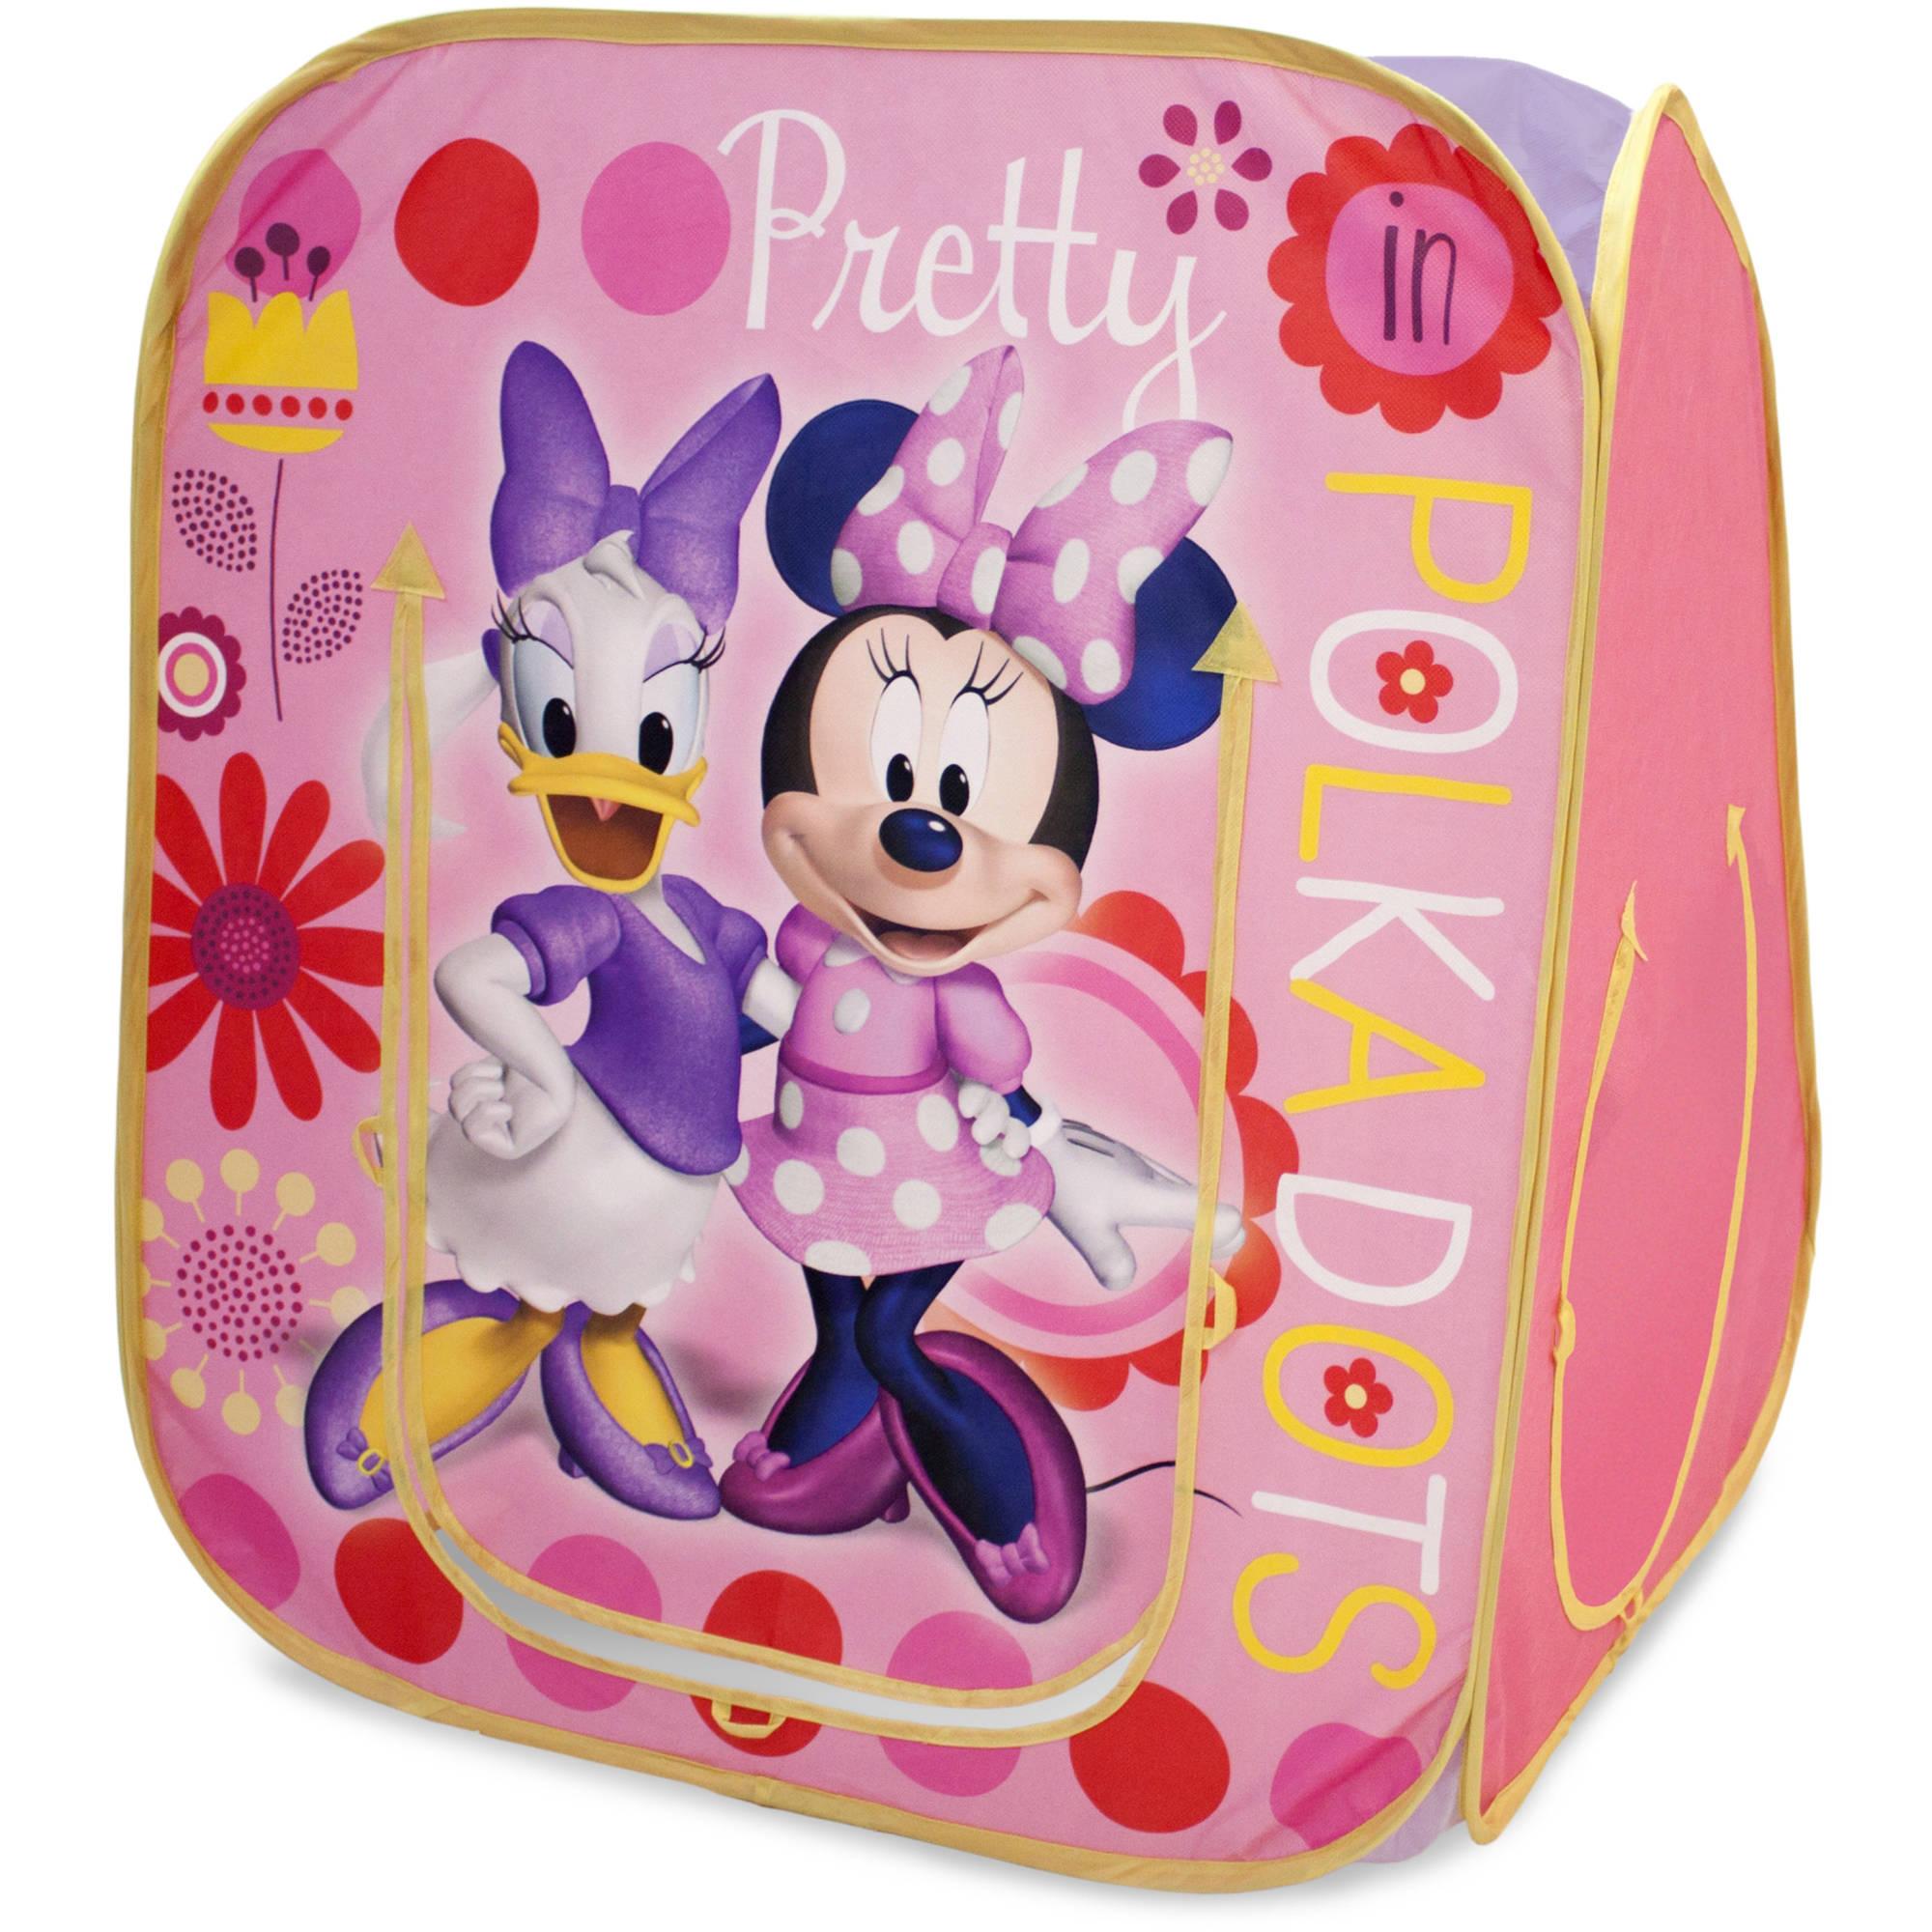 Playhut Minnie Mouse Hide N Play Playhouse Pink Walmart Com Walmart Com